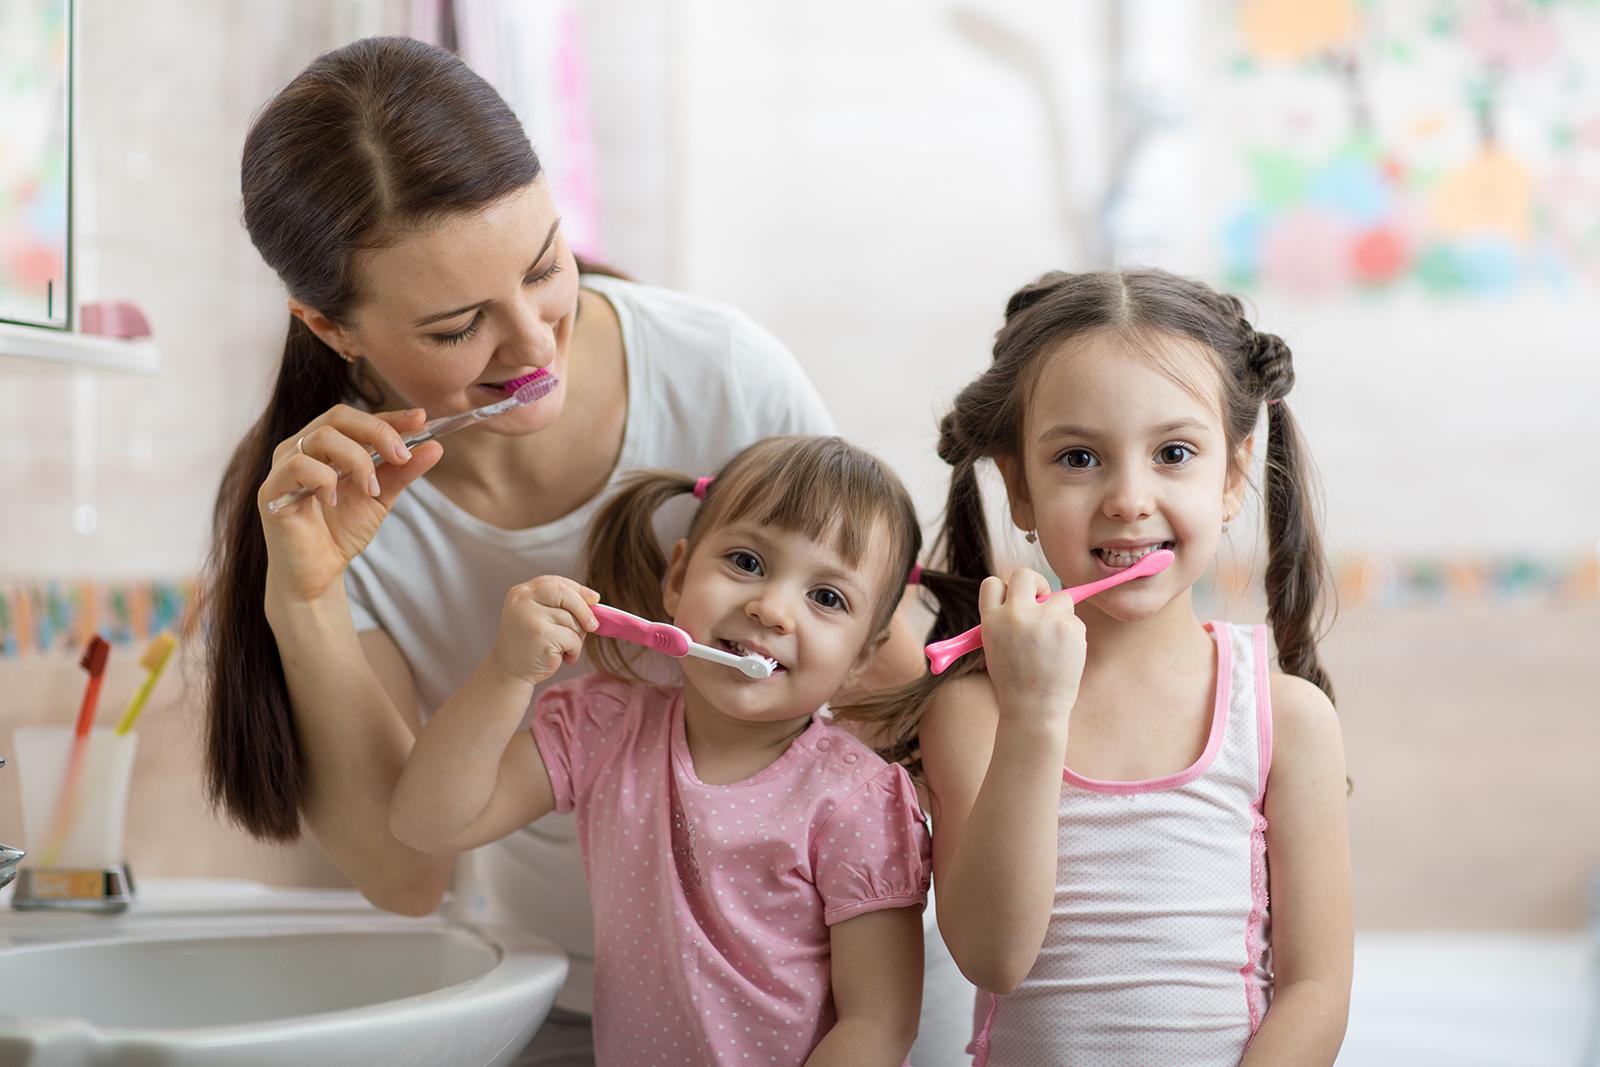 Ask Your College Station Dentist: October is National Dental Hygiene Month